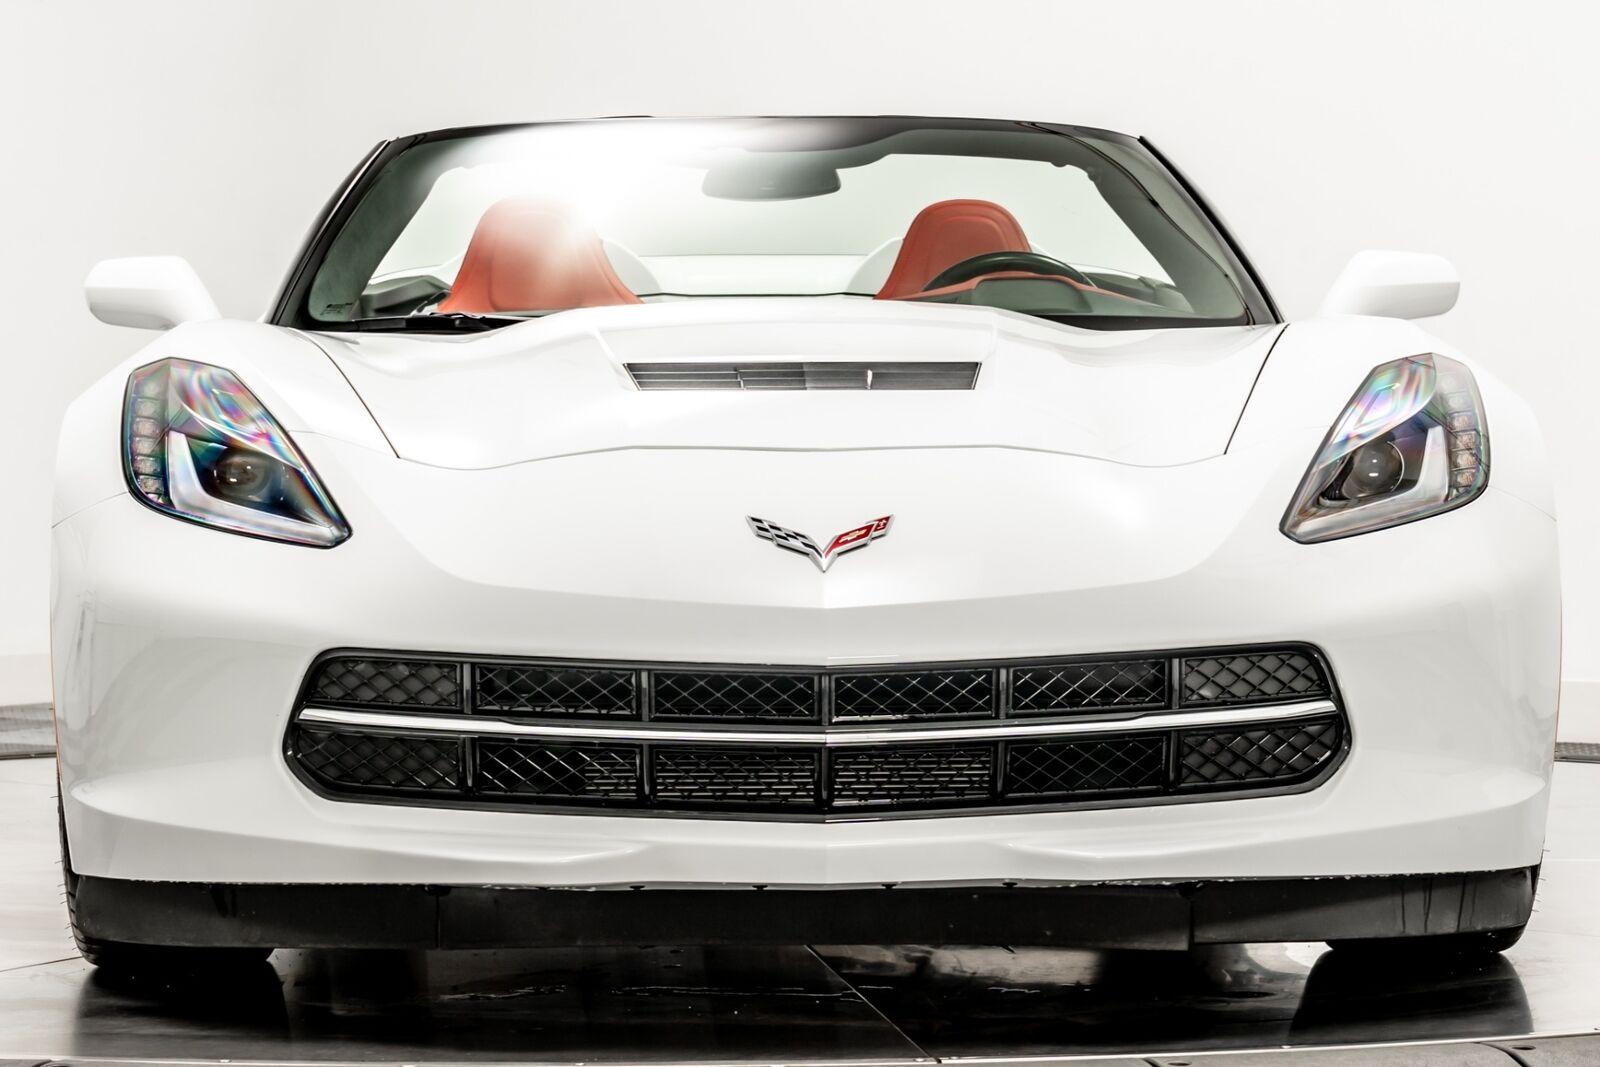 2015 White Chevrolet Corvette Convertible 3LT   C7 Corvette Photo 3